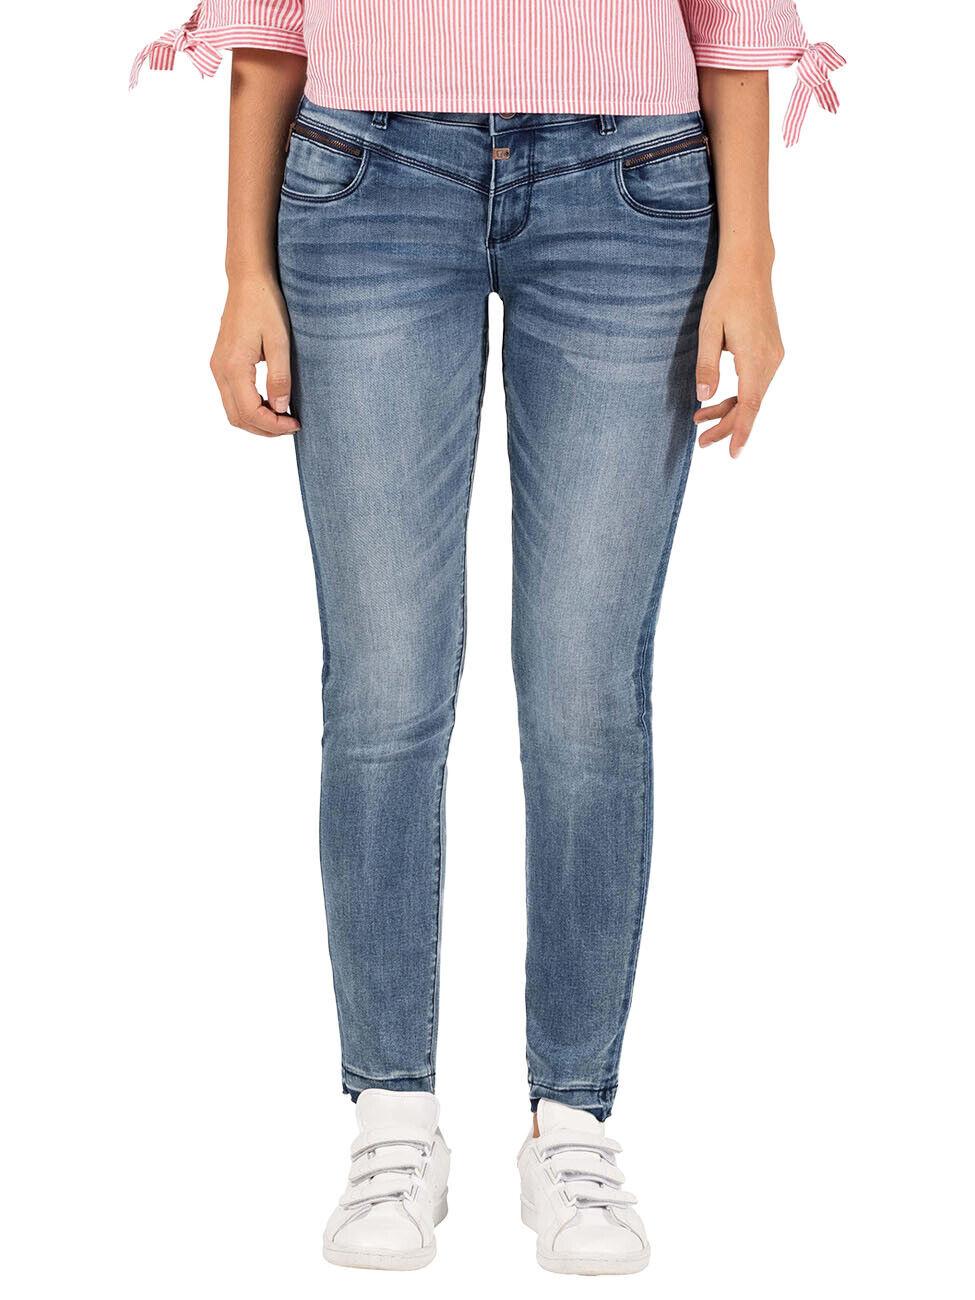 Timezone Damen Jeans Sade - Slim Fit - Blau - Shades of Blau Wash